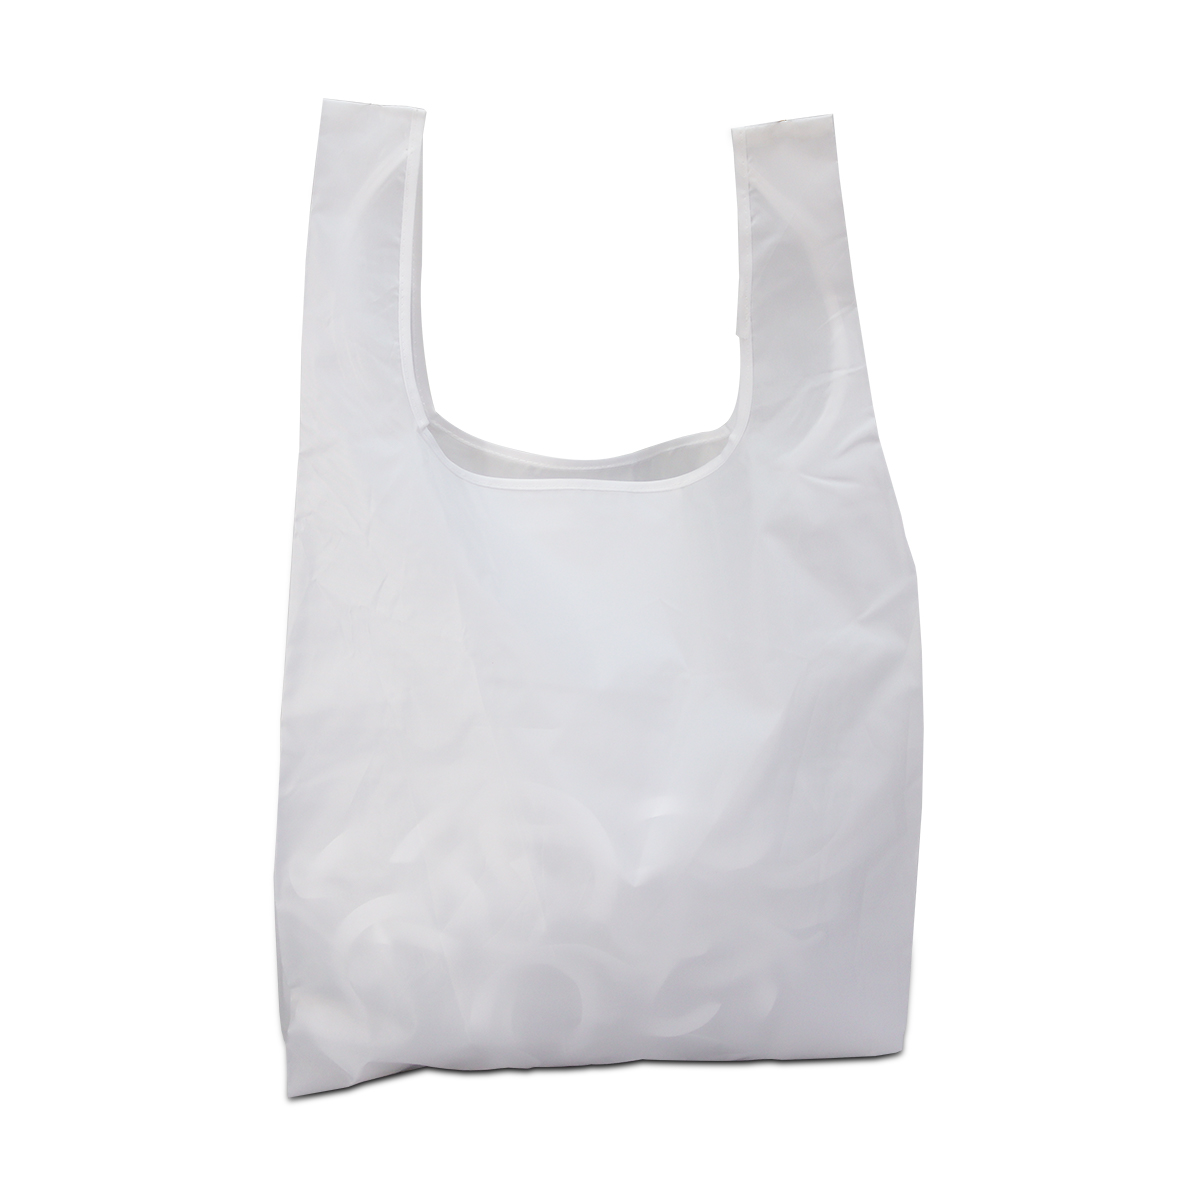 herbruikbaretassen-opvouwbarentassen-wit-product